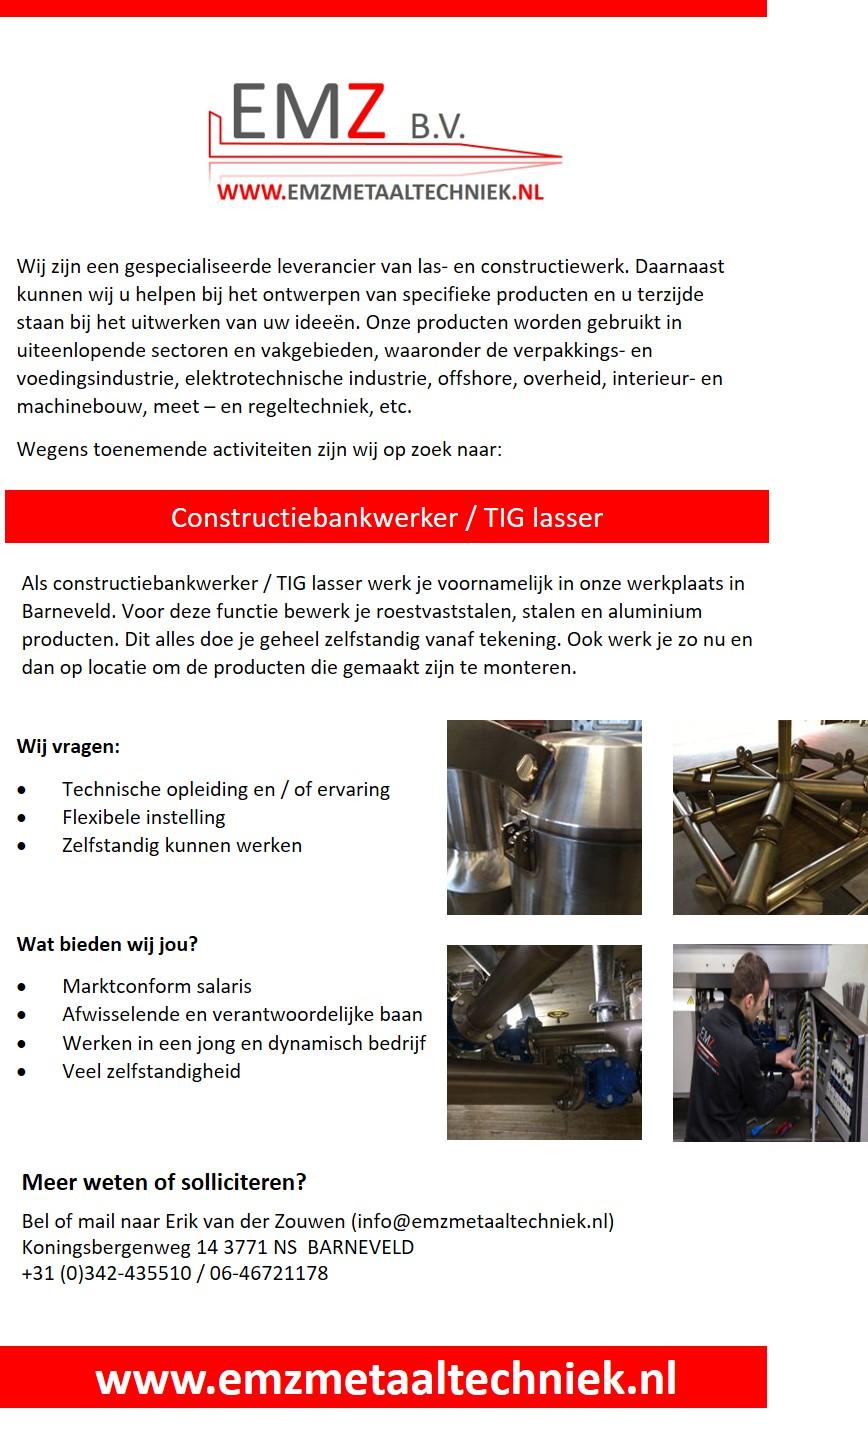 https://www.emzmetaaltechniek.nl/wp-content/uploads/2018/07/Vacature-EMZ.jpg